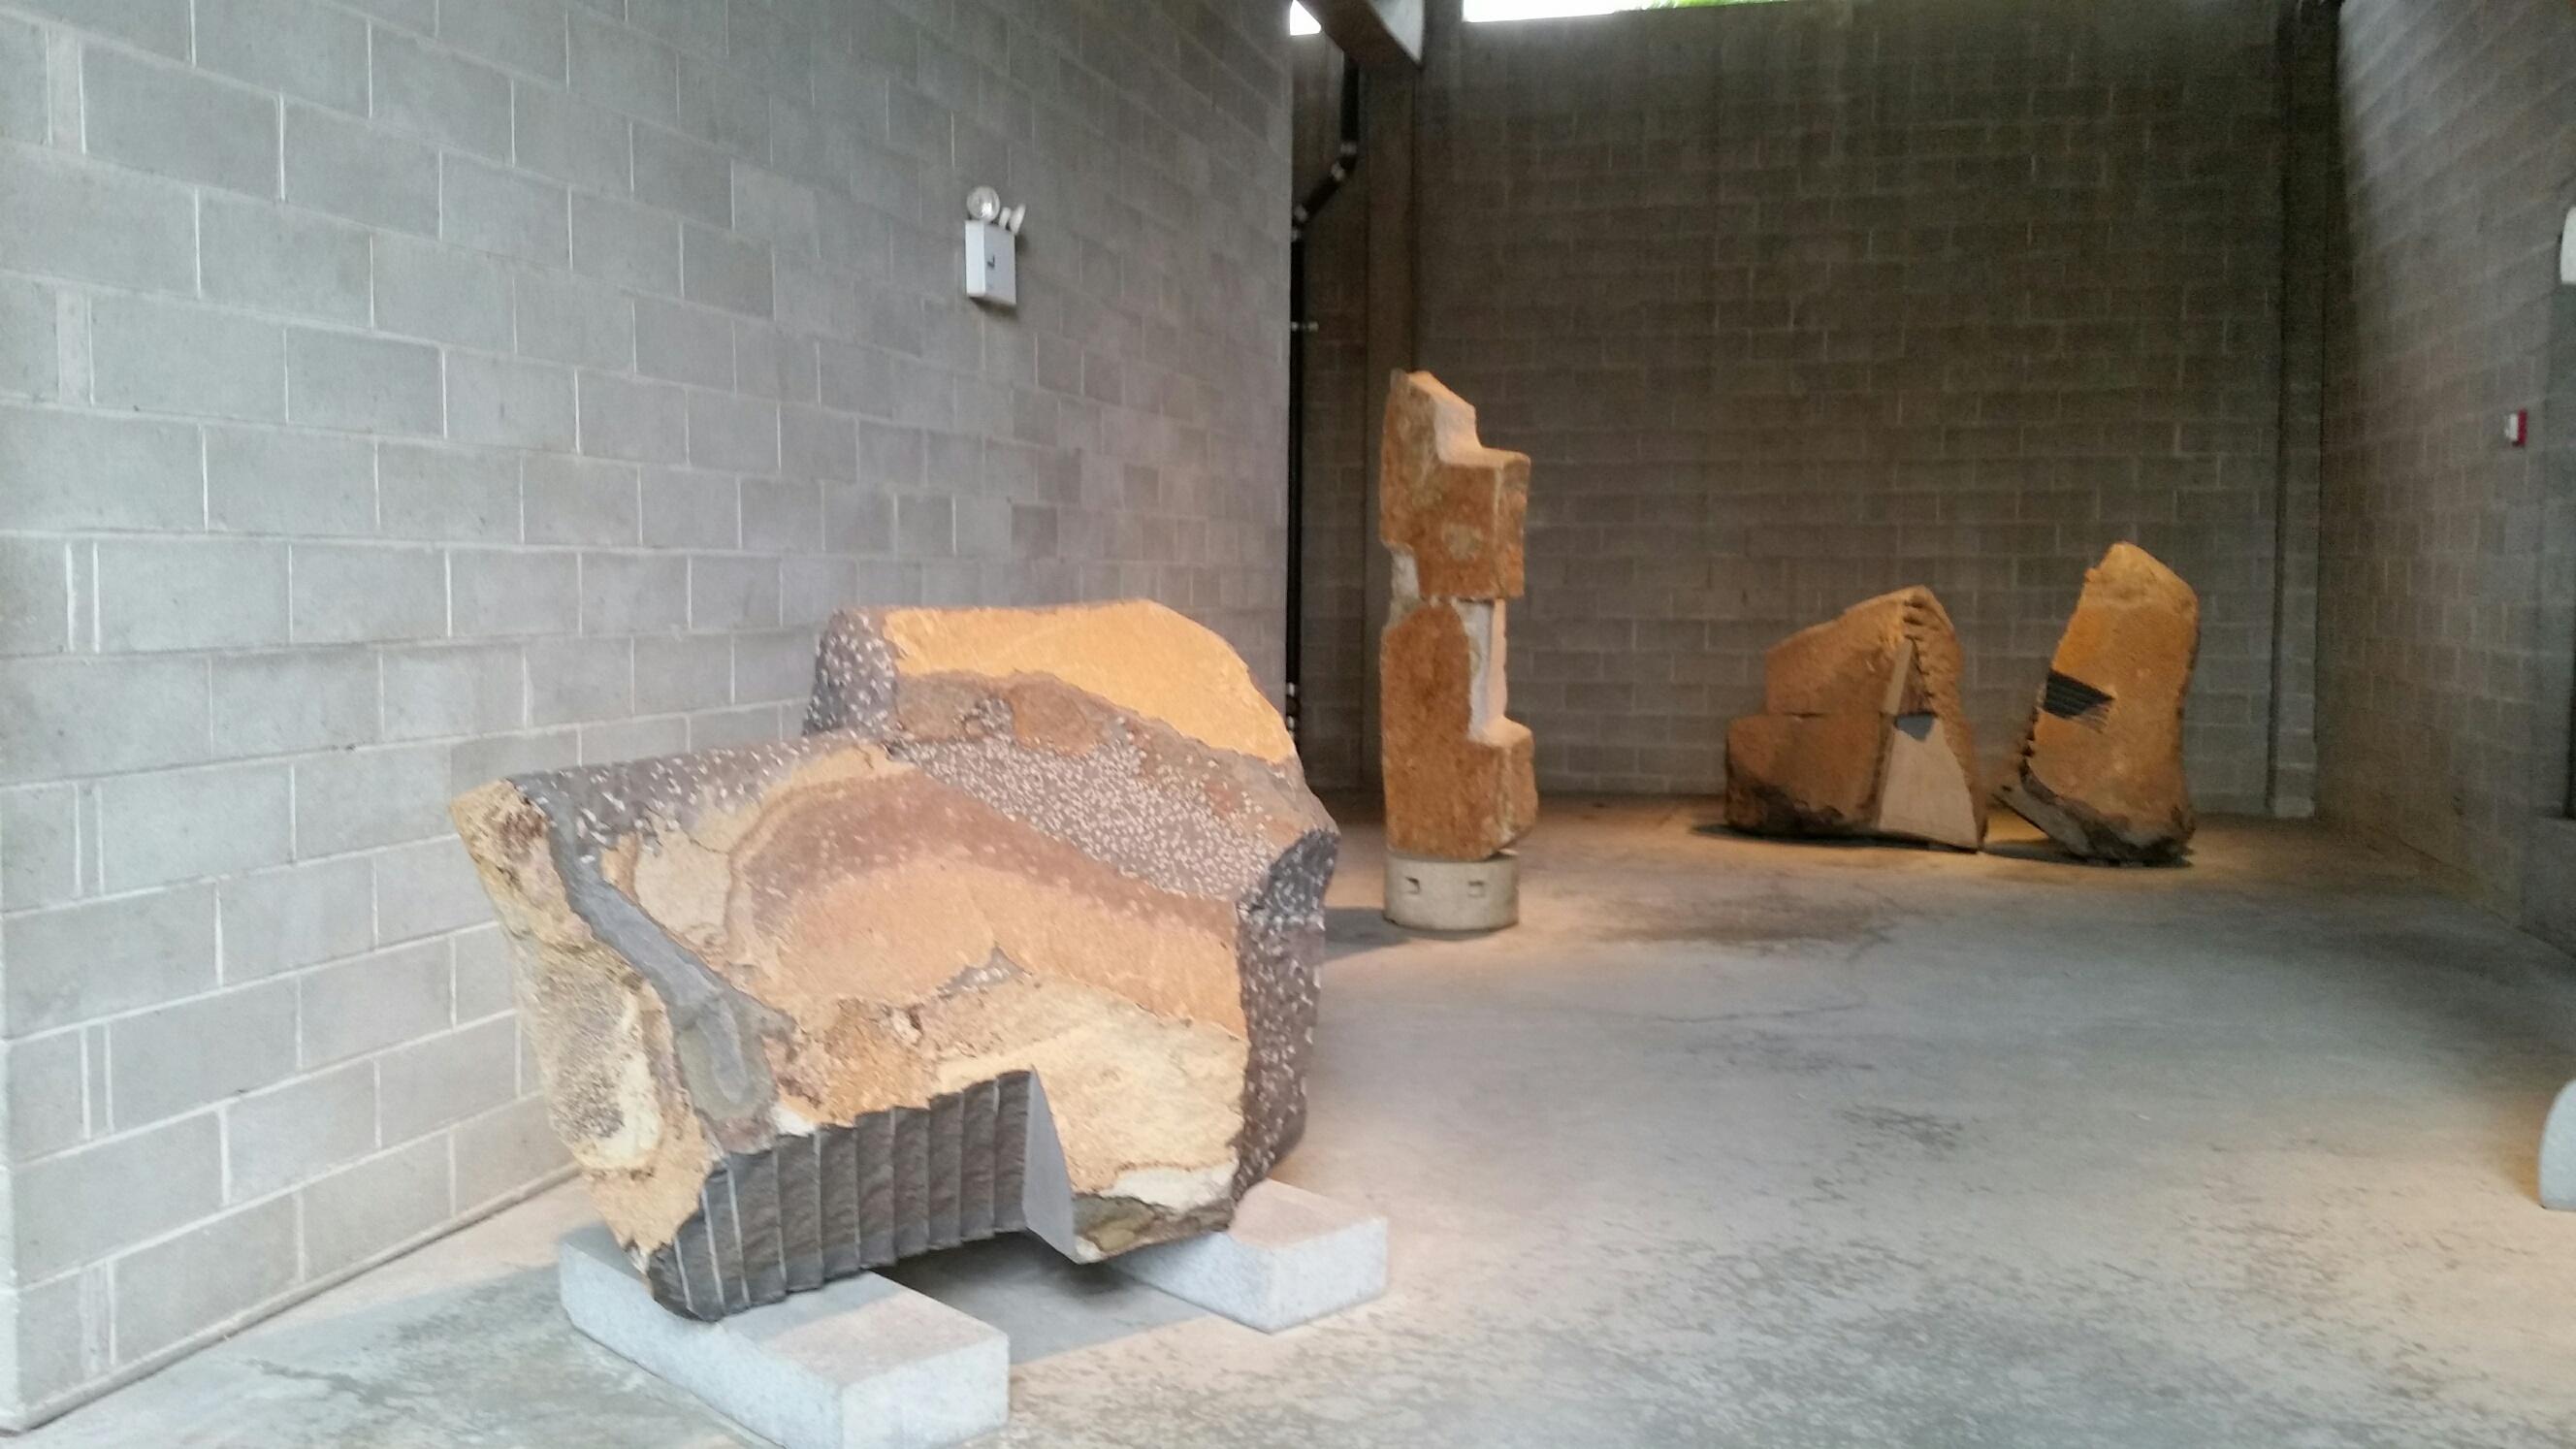 July at the Noguchi Museum